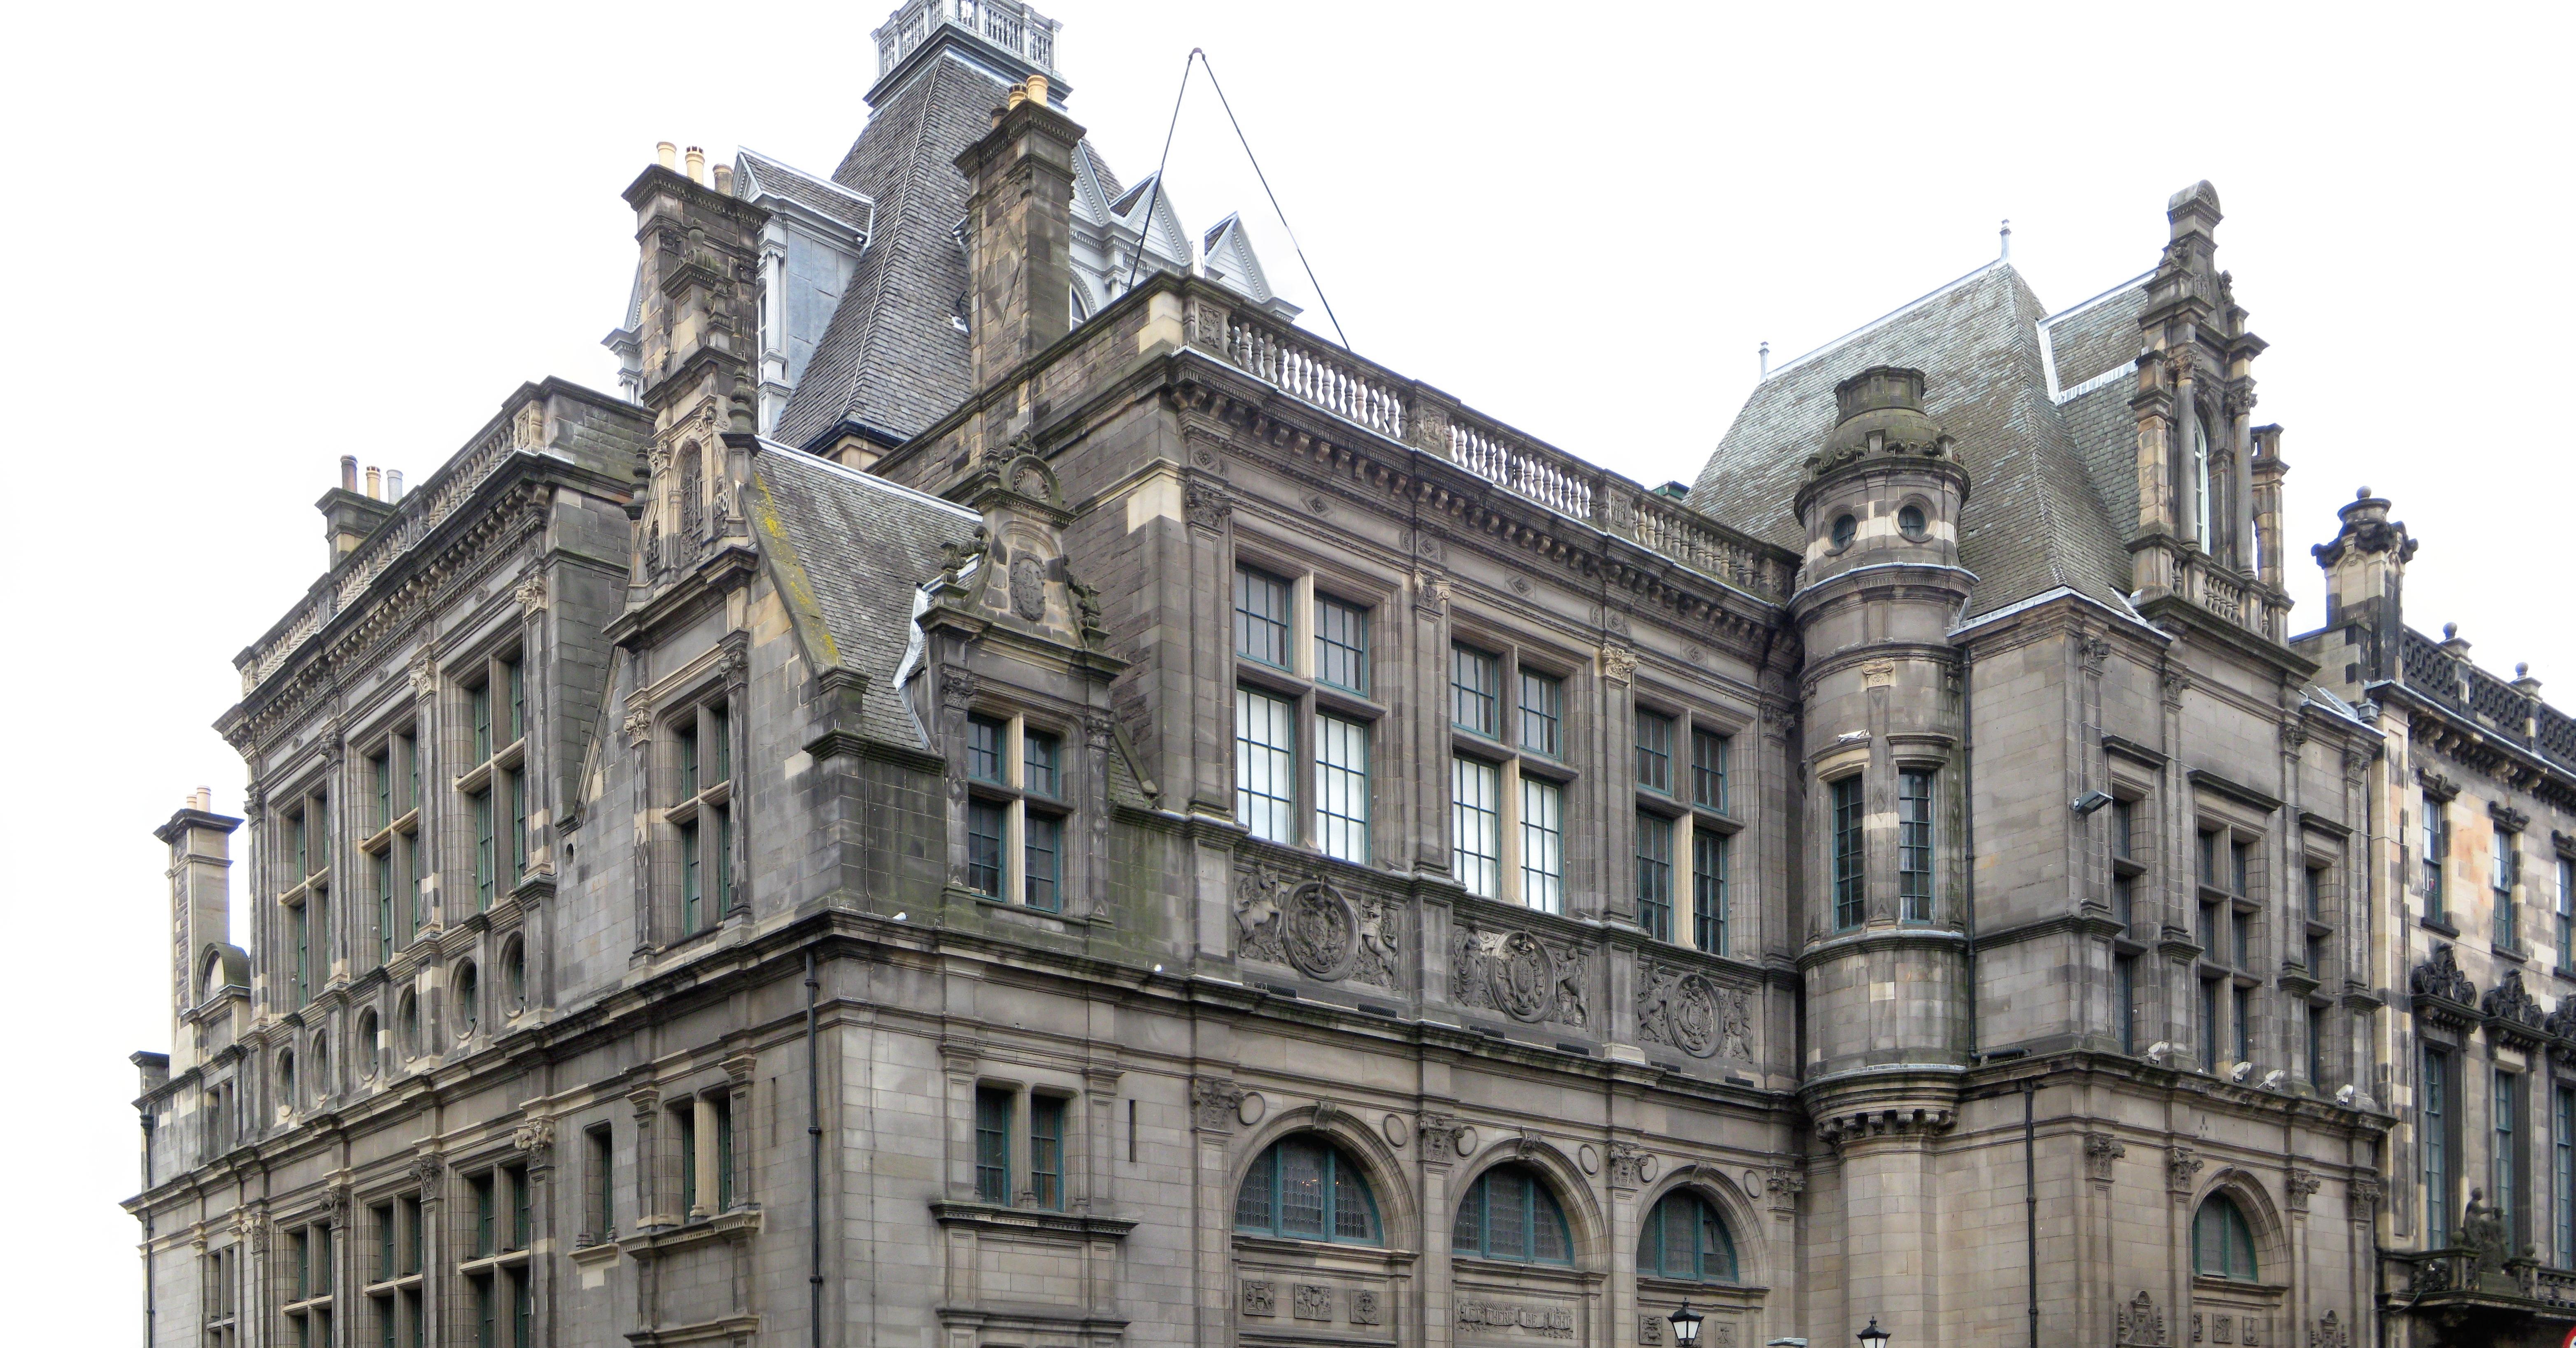 Central_Library_Edinburgh_pano3-1